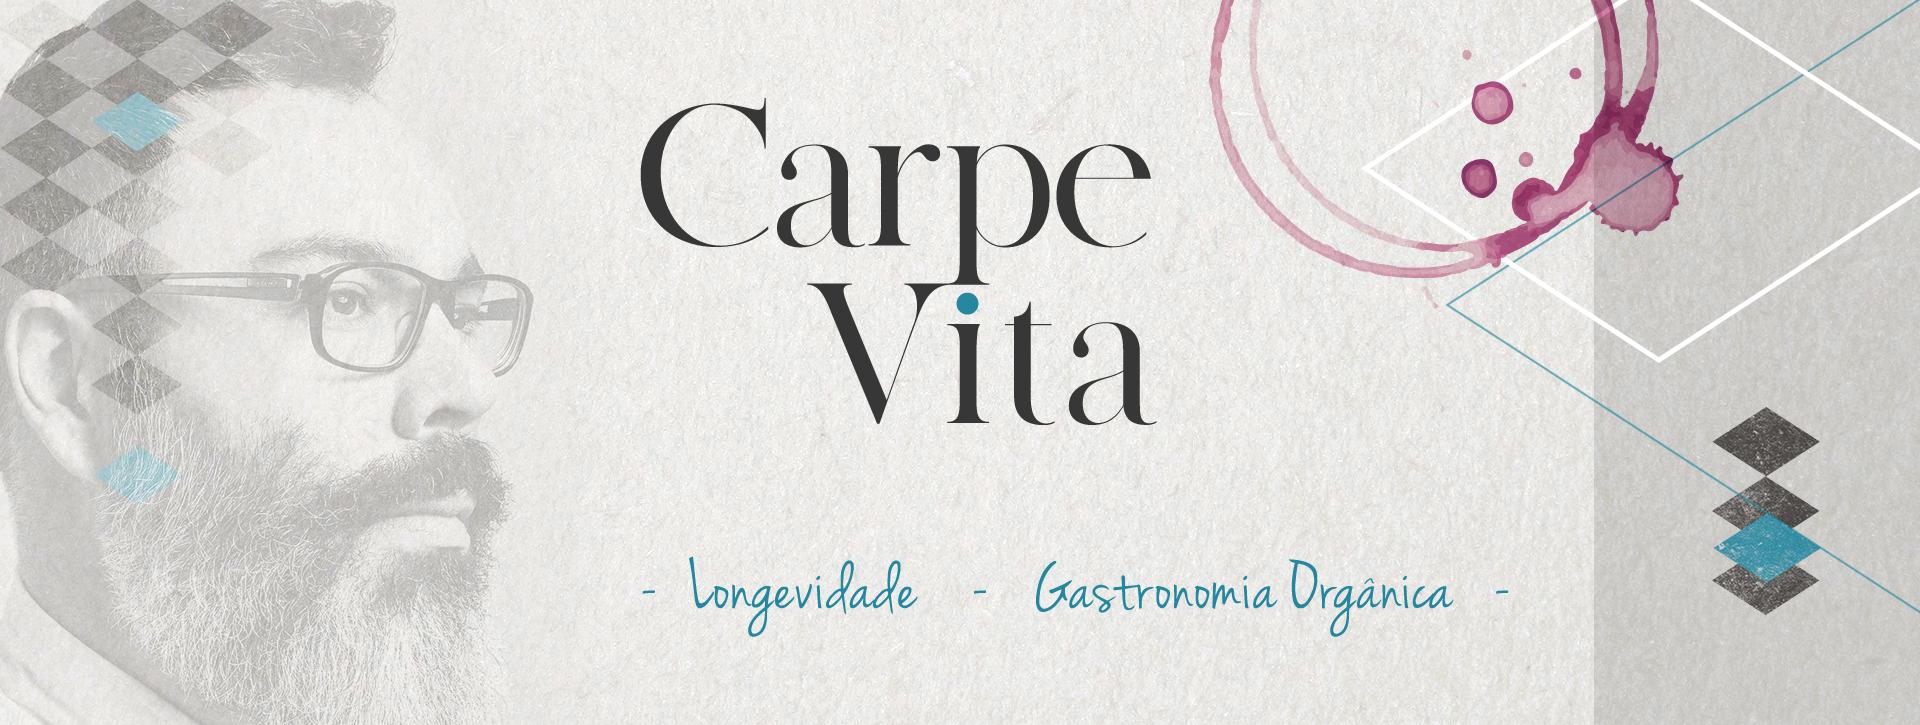 Le Manjue - carpe vita banner-site.jpg